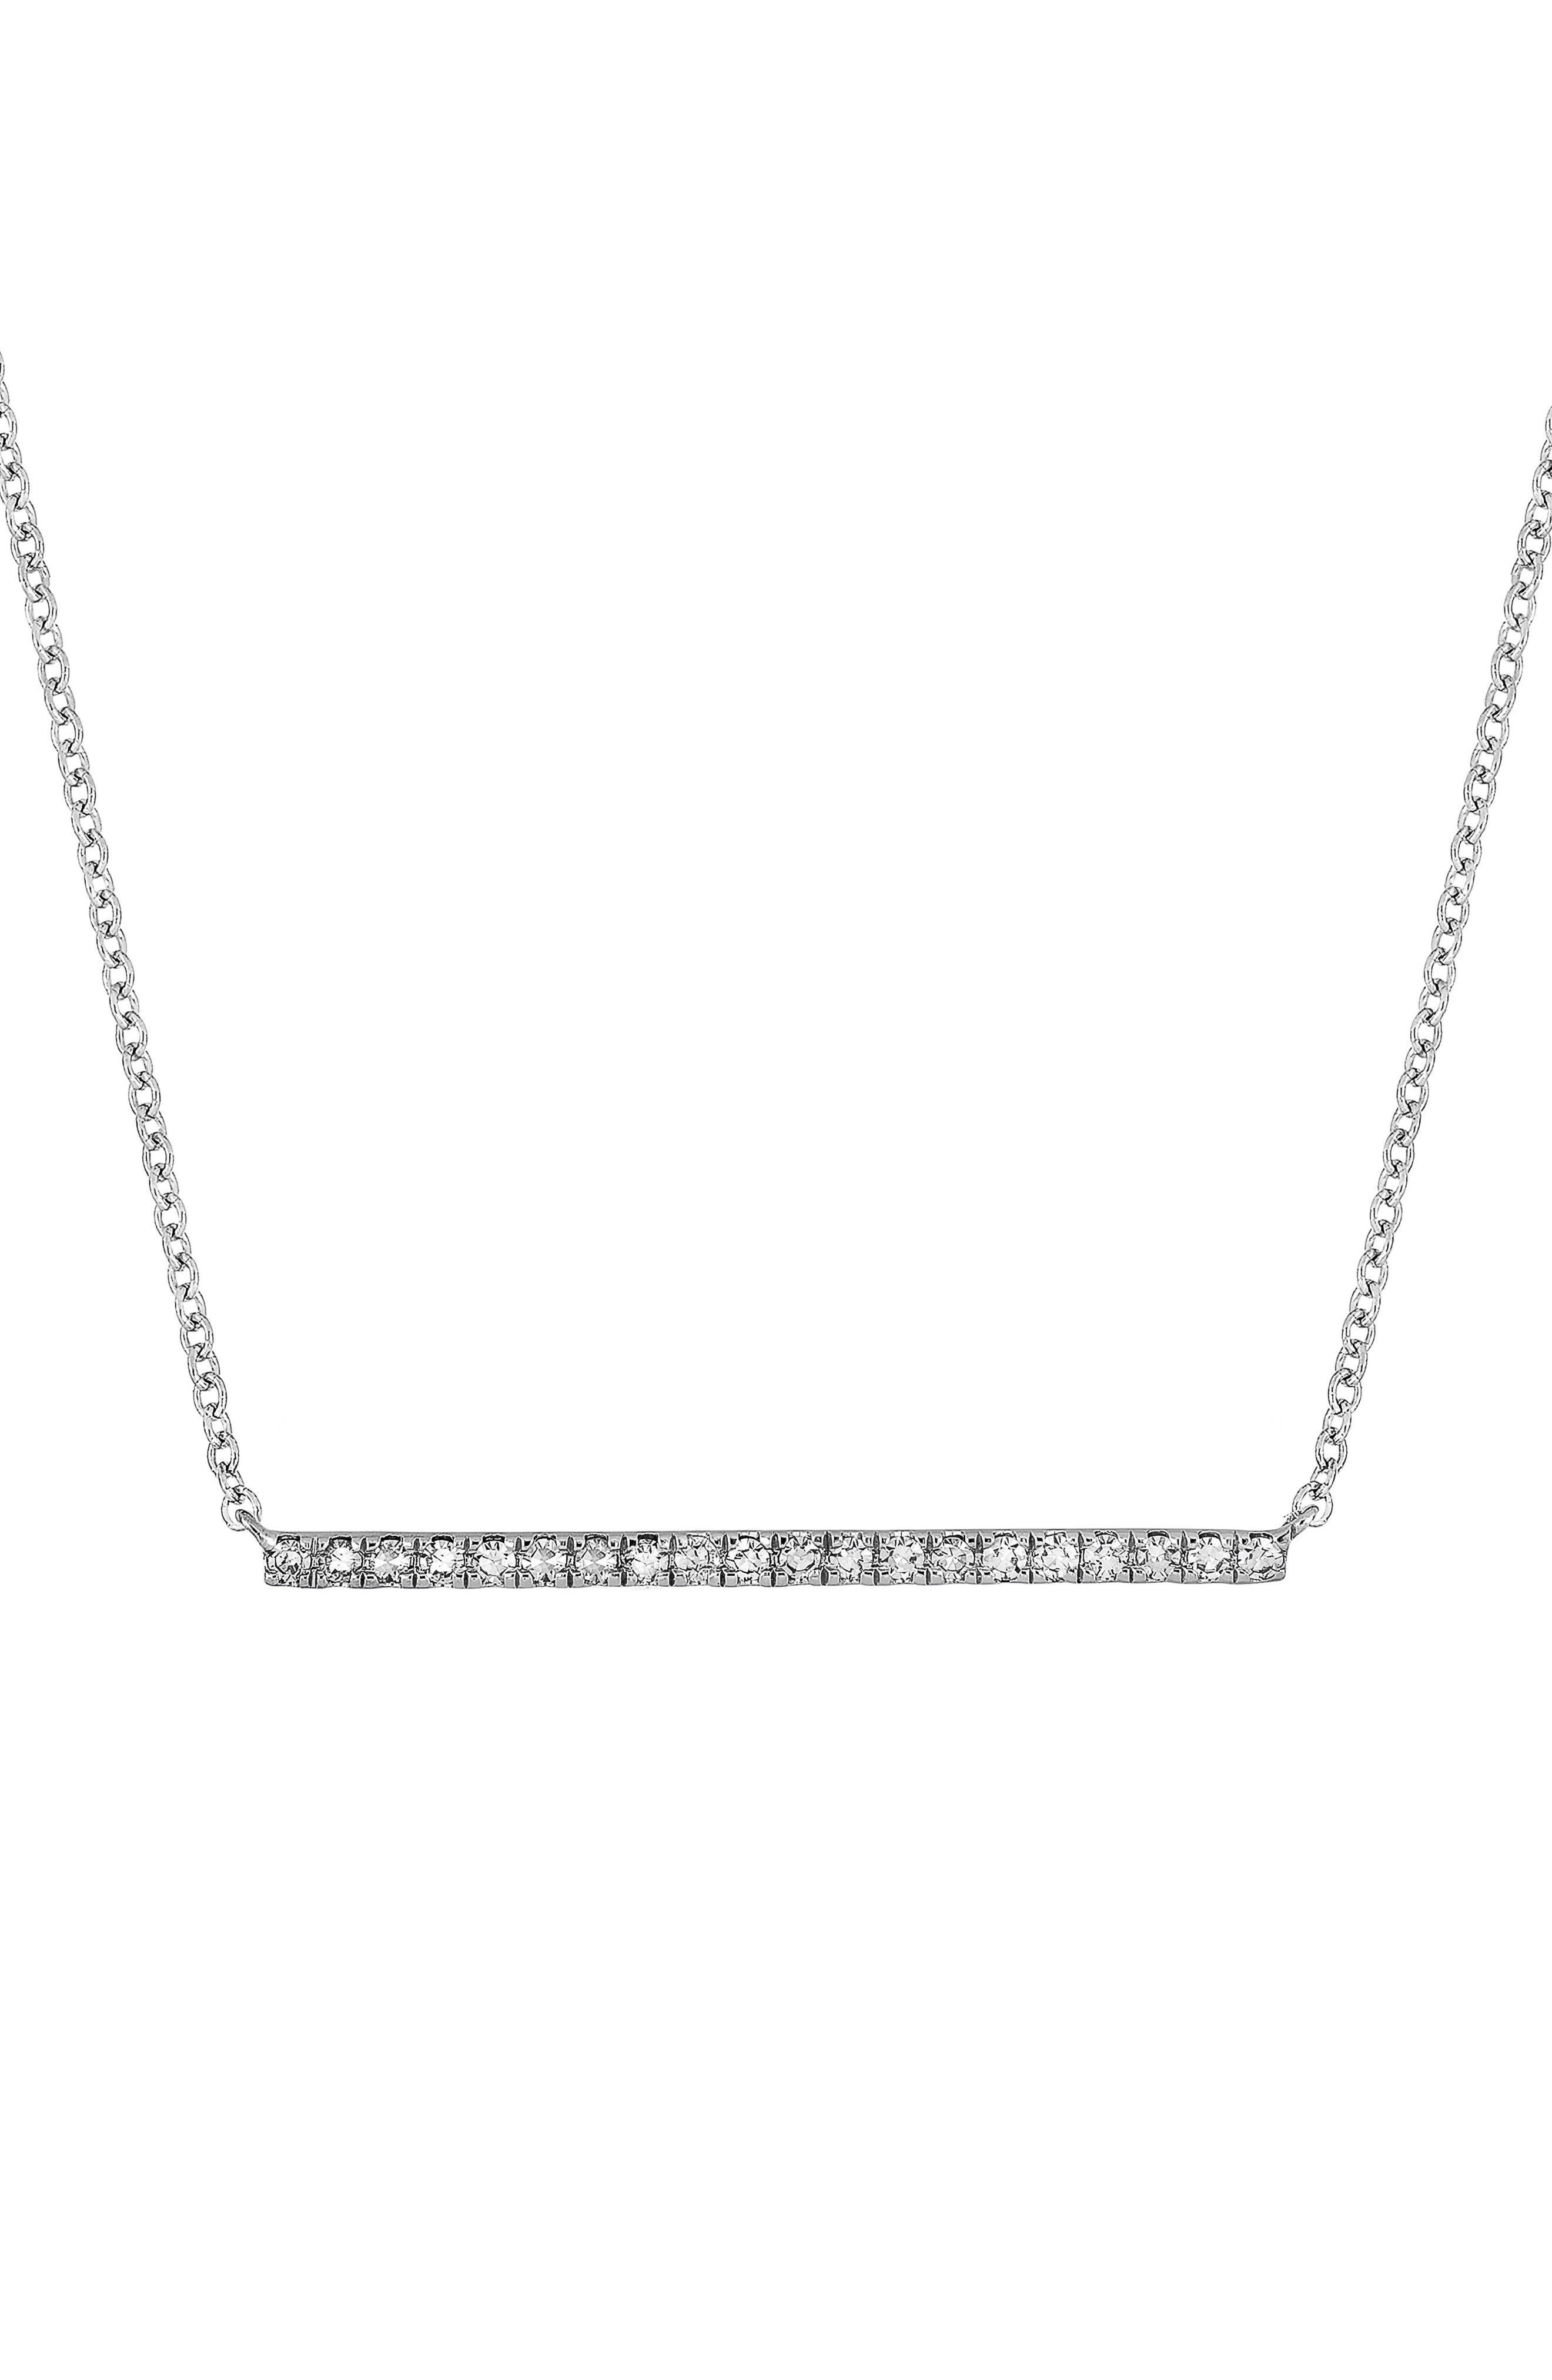 CARRIERE JEWELRY,                             Carrière Diamond Bar Pendant,                             Main thumbnail 1, color,                             040